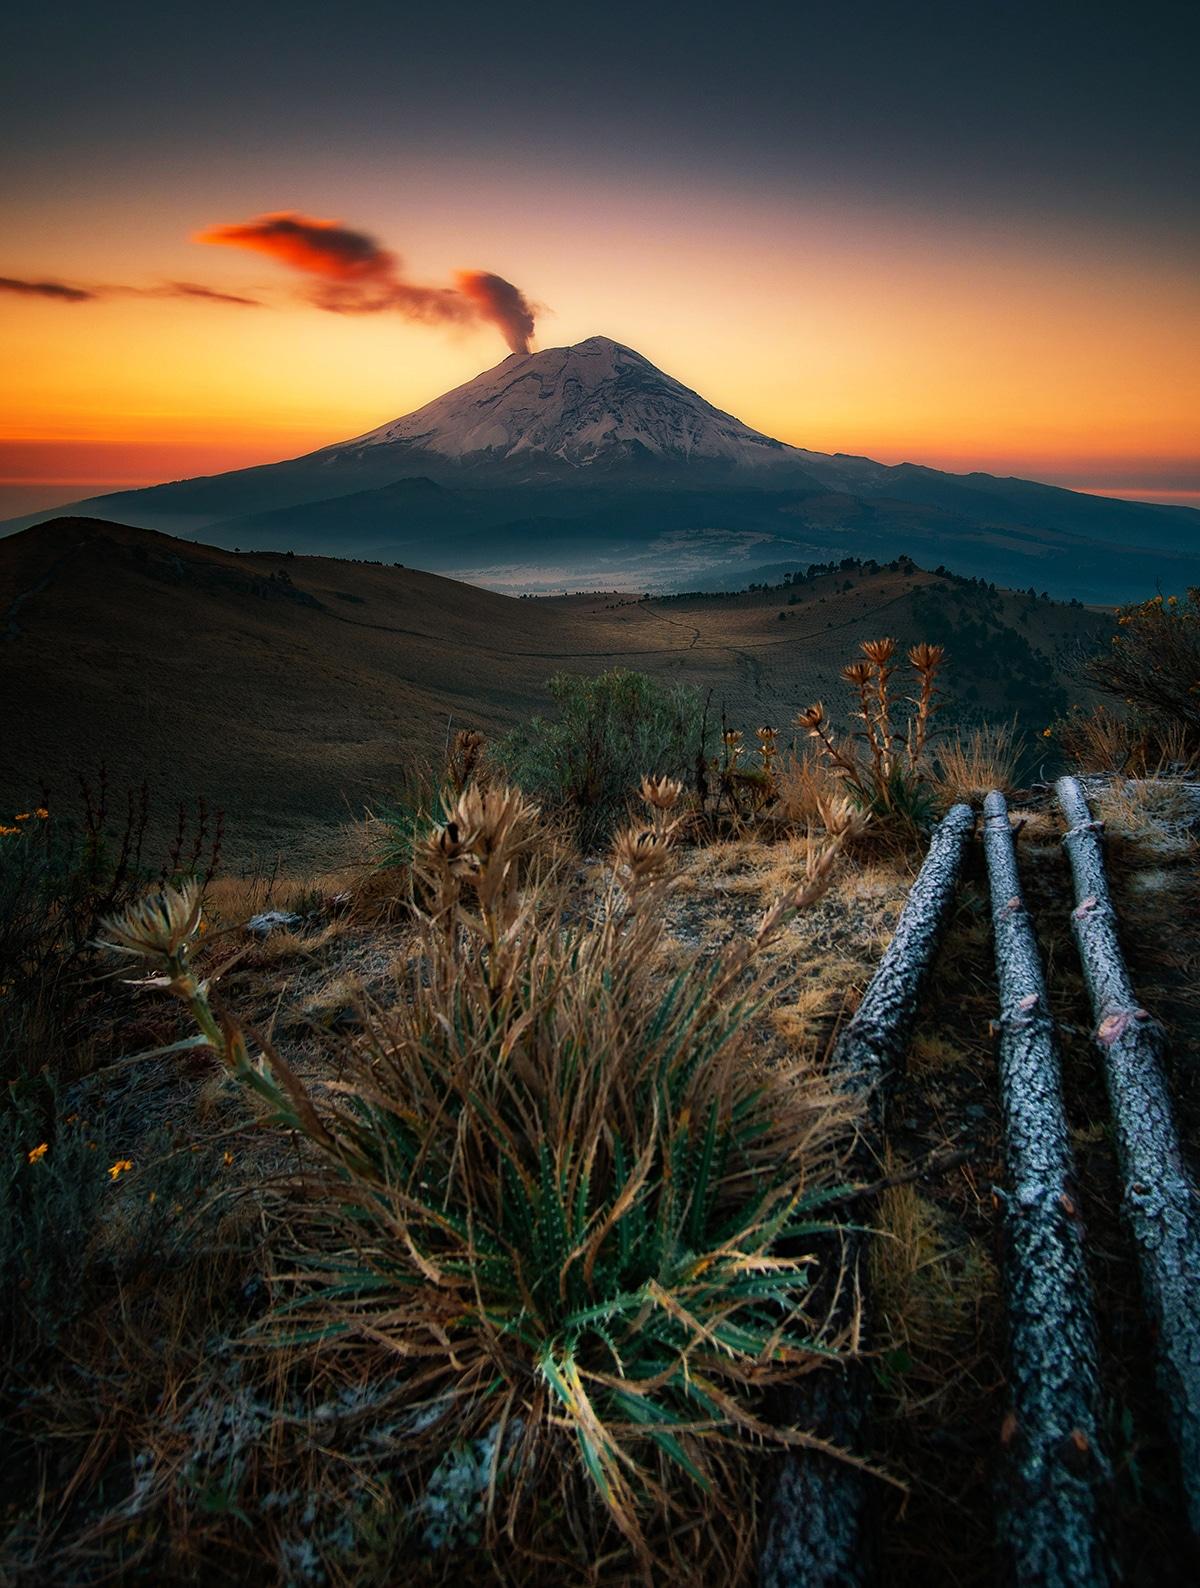 O Ηλιος αρχίζει να ανατέλλει πίσω από το ηφαίστειο Popocatépetl στο Μεξικό σε μια φωτογραφία με τίτλο «Πρώτη Ανάσα»